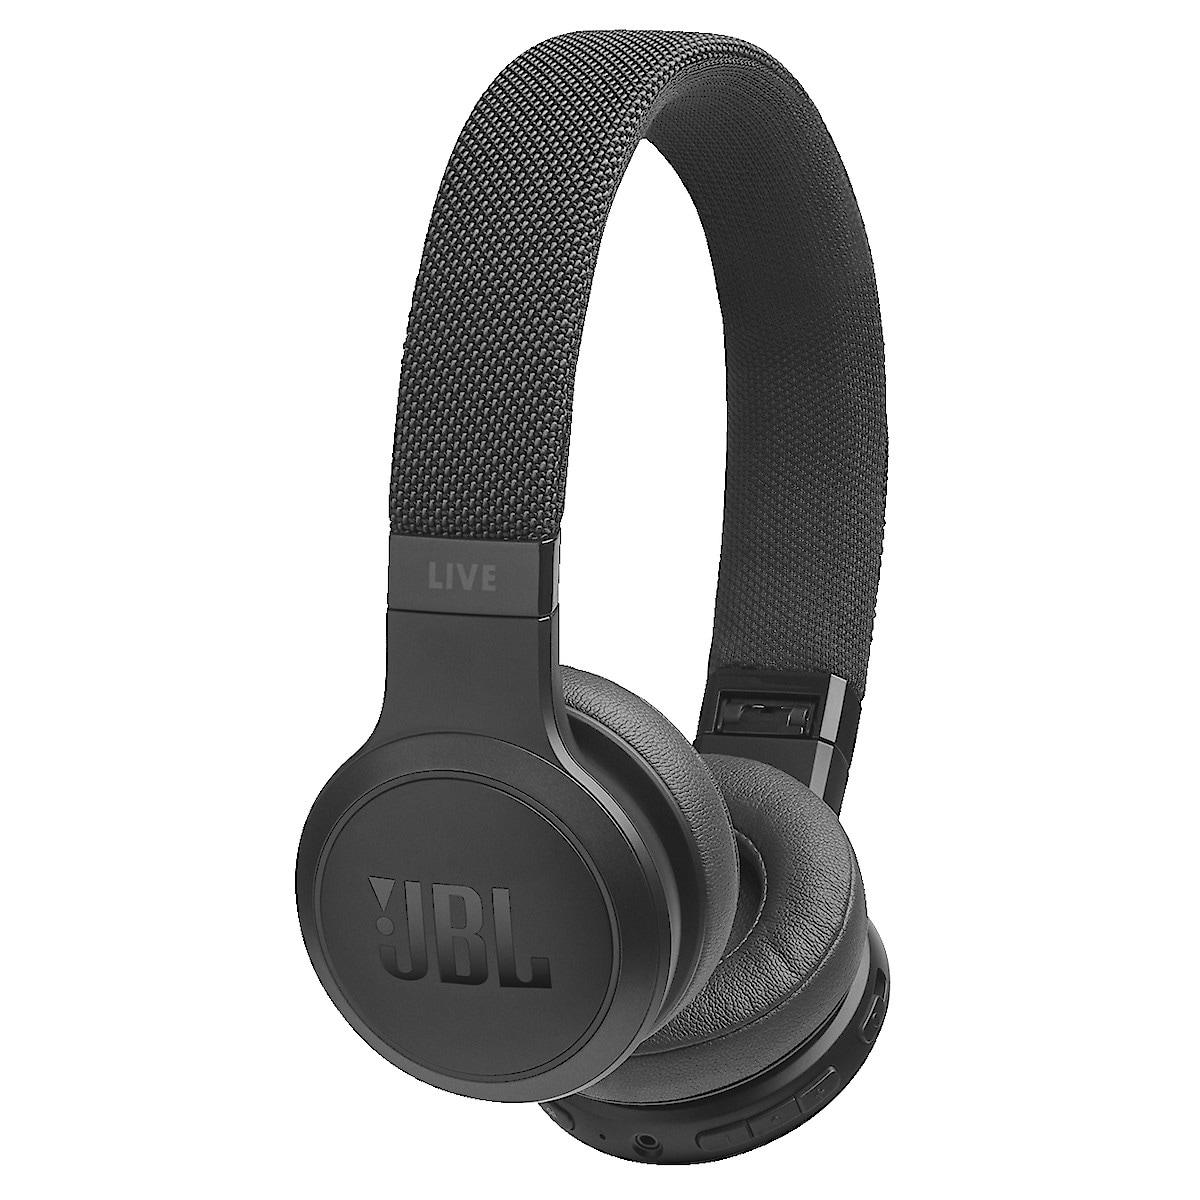 Trådlösa hörlurar JBL Live400BT